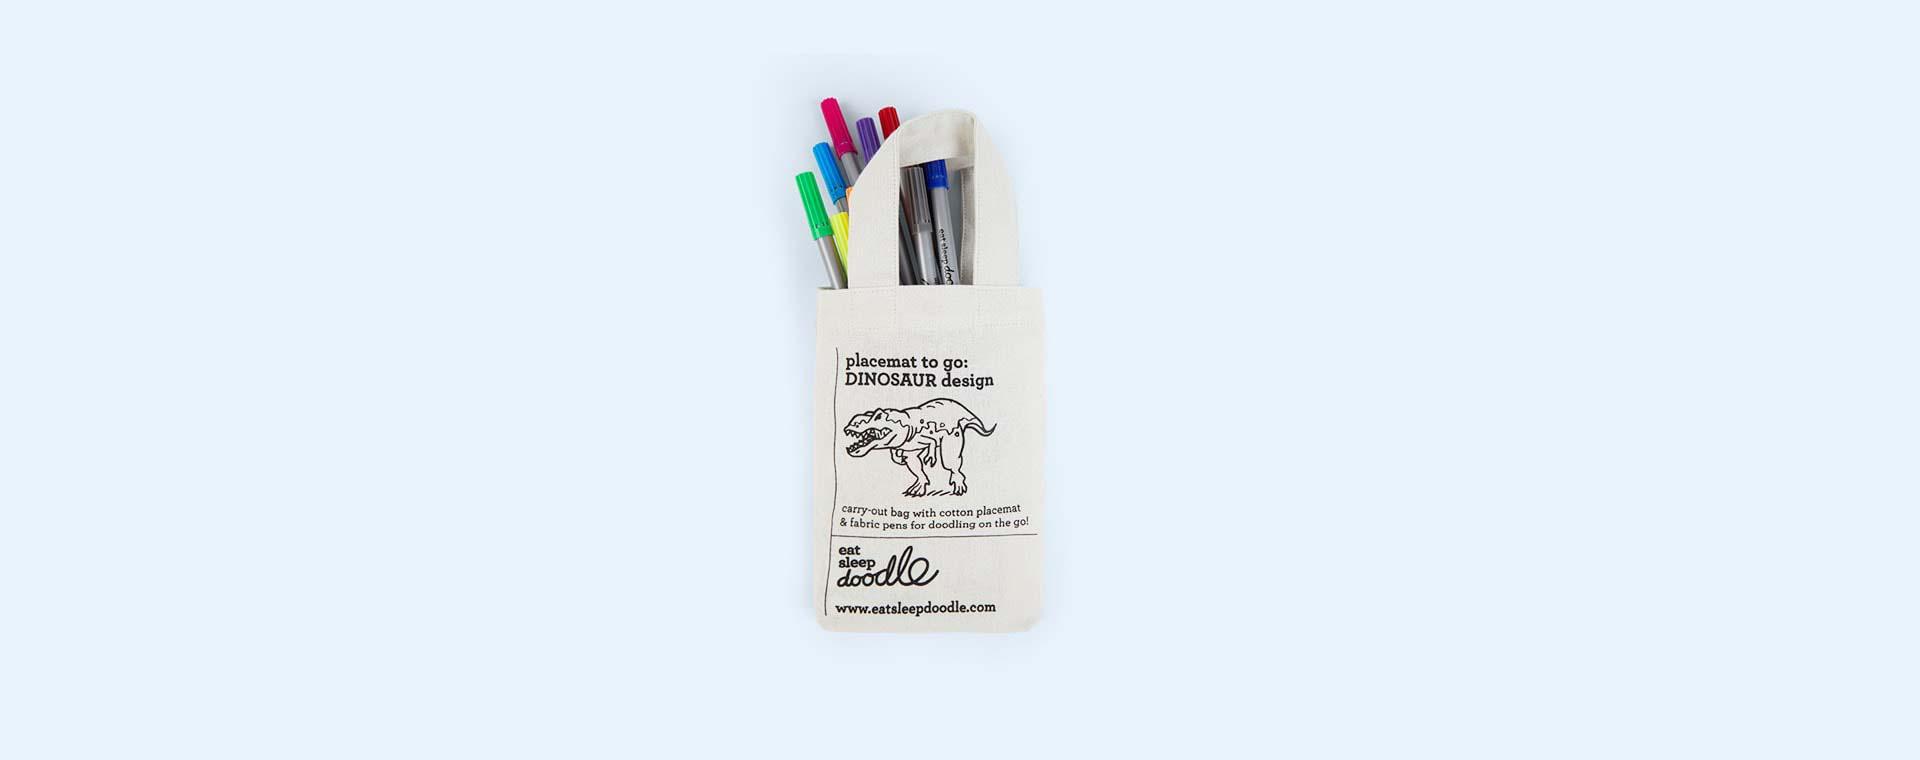 Dinosaur Eat Sleep Doodle Doodle Placemat to Go